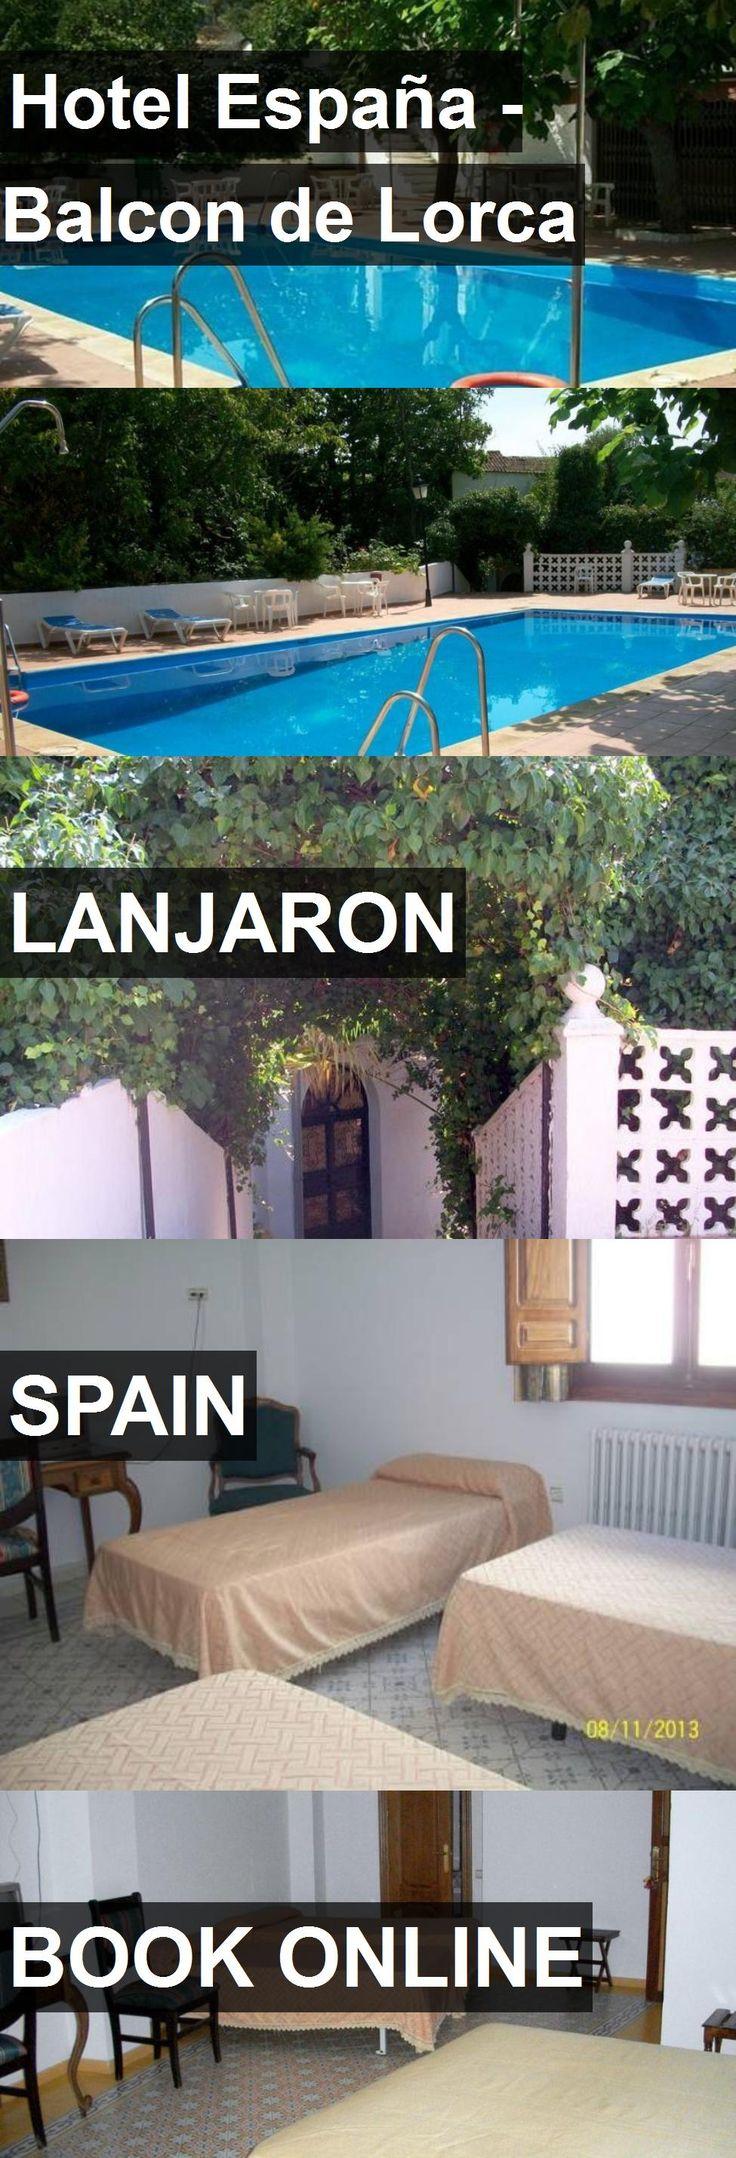 Hotel Hotel España - Balcon de Lorca in Lanjaron, Spain. For more information, photos, reviews and best prices please follow the link. #Spain #Lanjaron #HotelEspaña-BalcondeLorca #hotel #travel #vacation